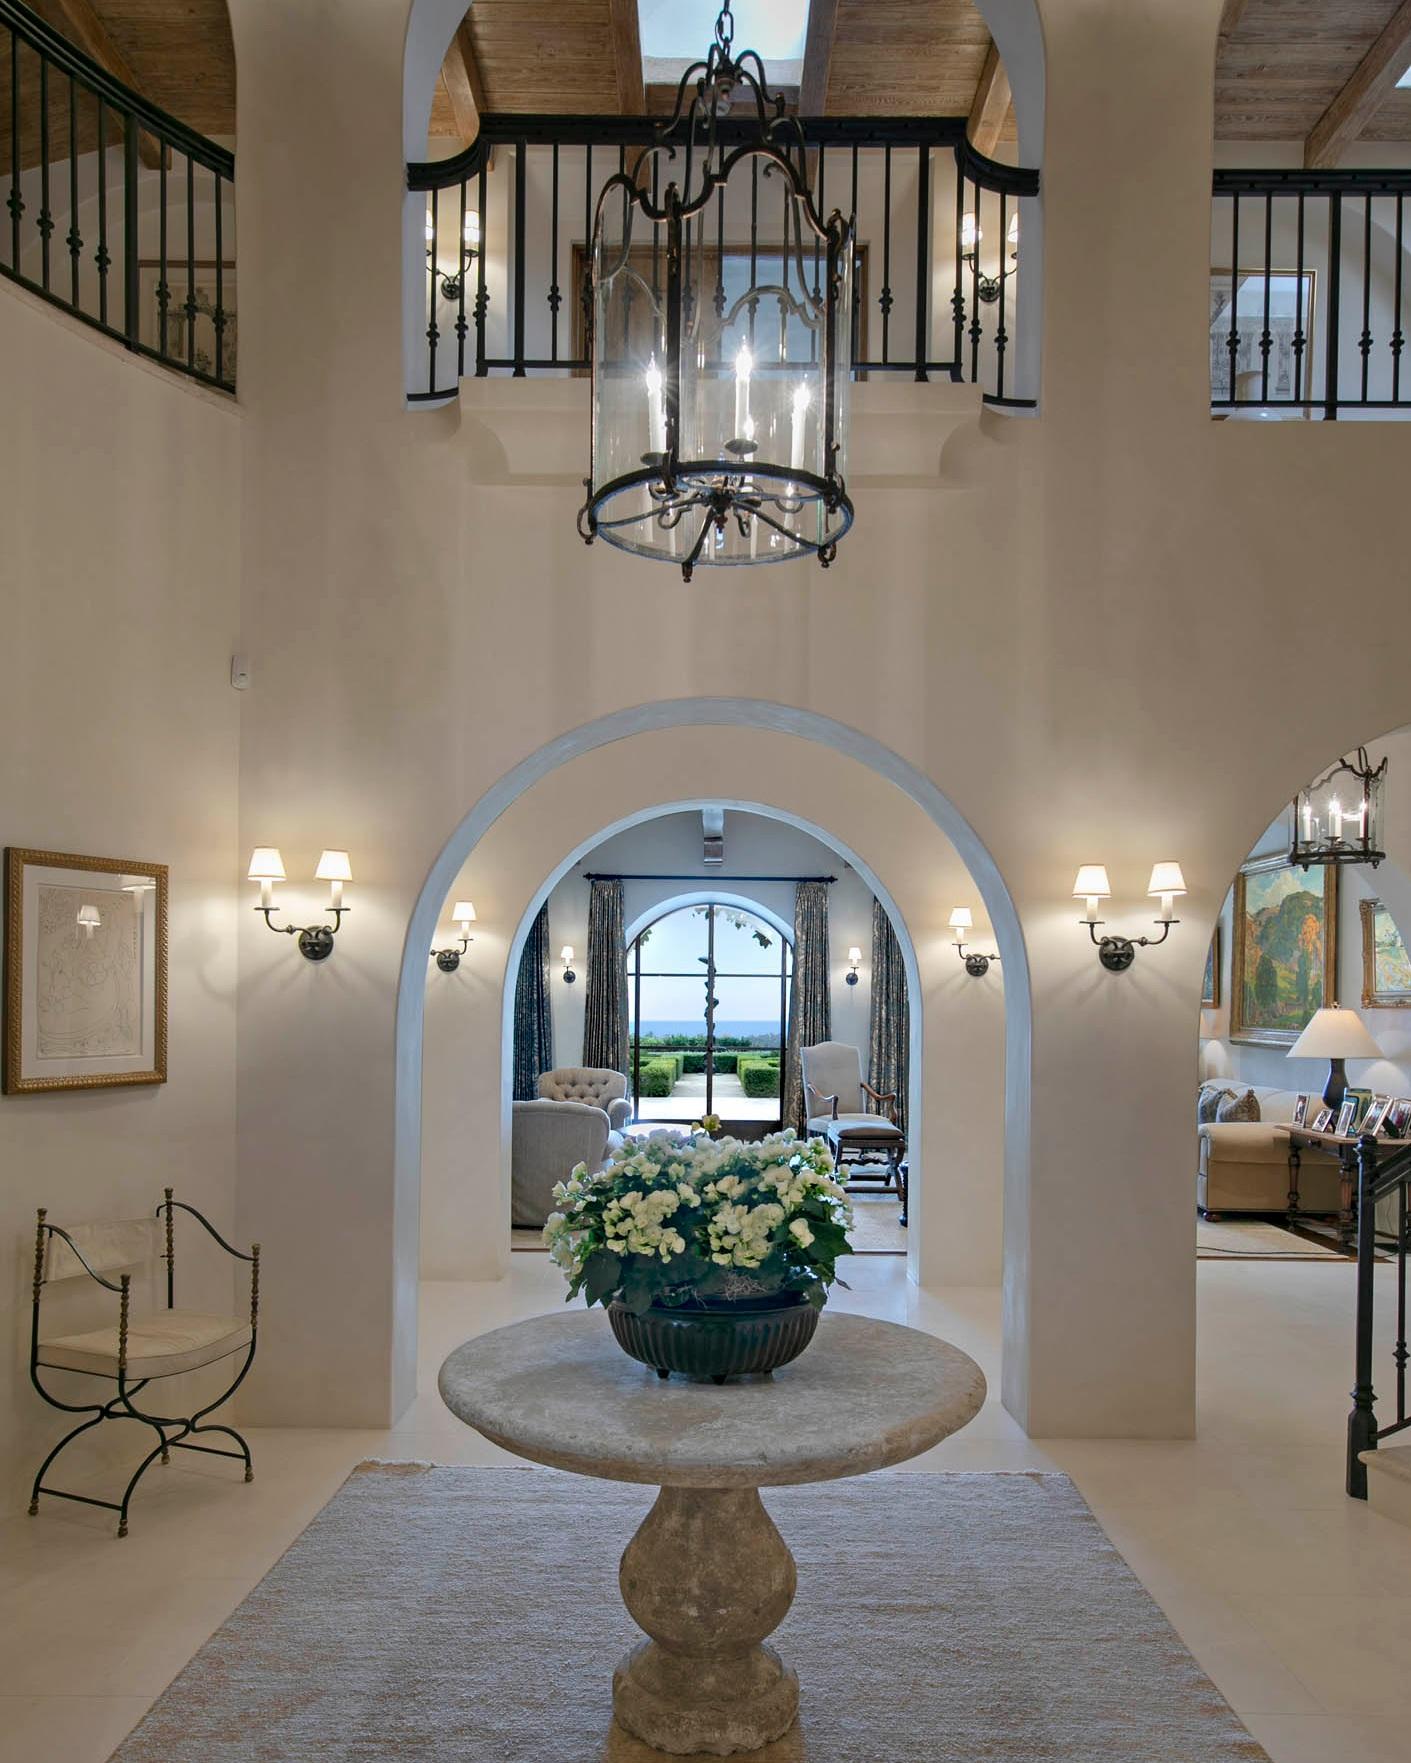 Park+Lane+Estate+Montecito+Harbor+views+ocean+view+private+Riskin+Partners